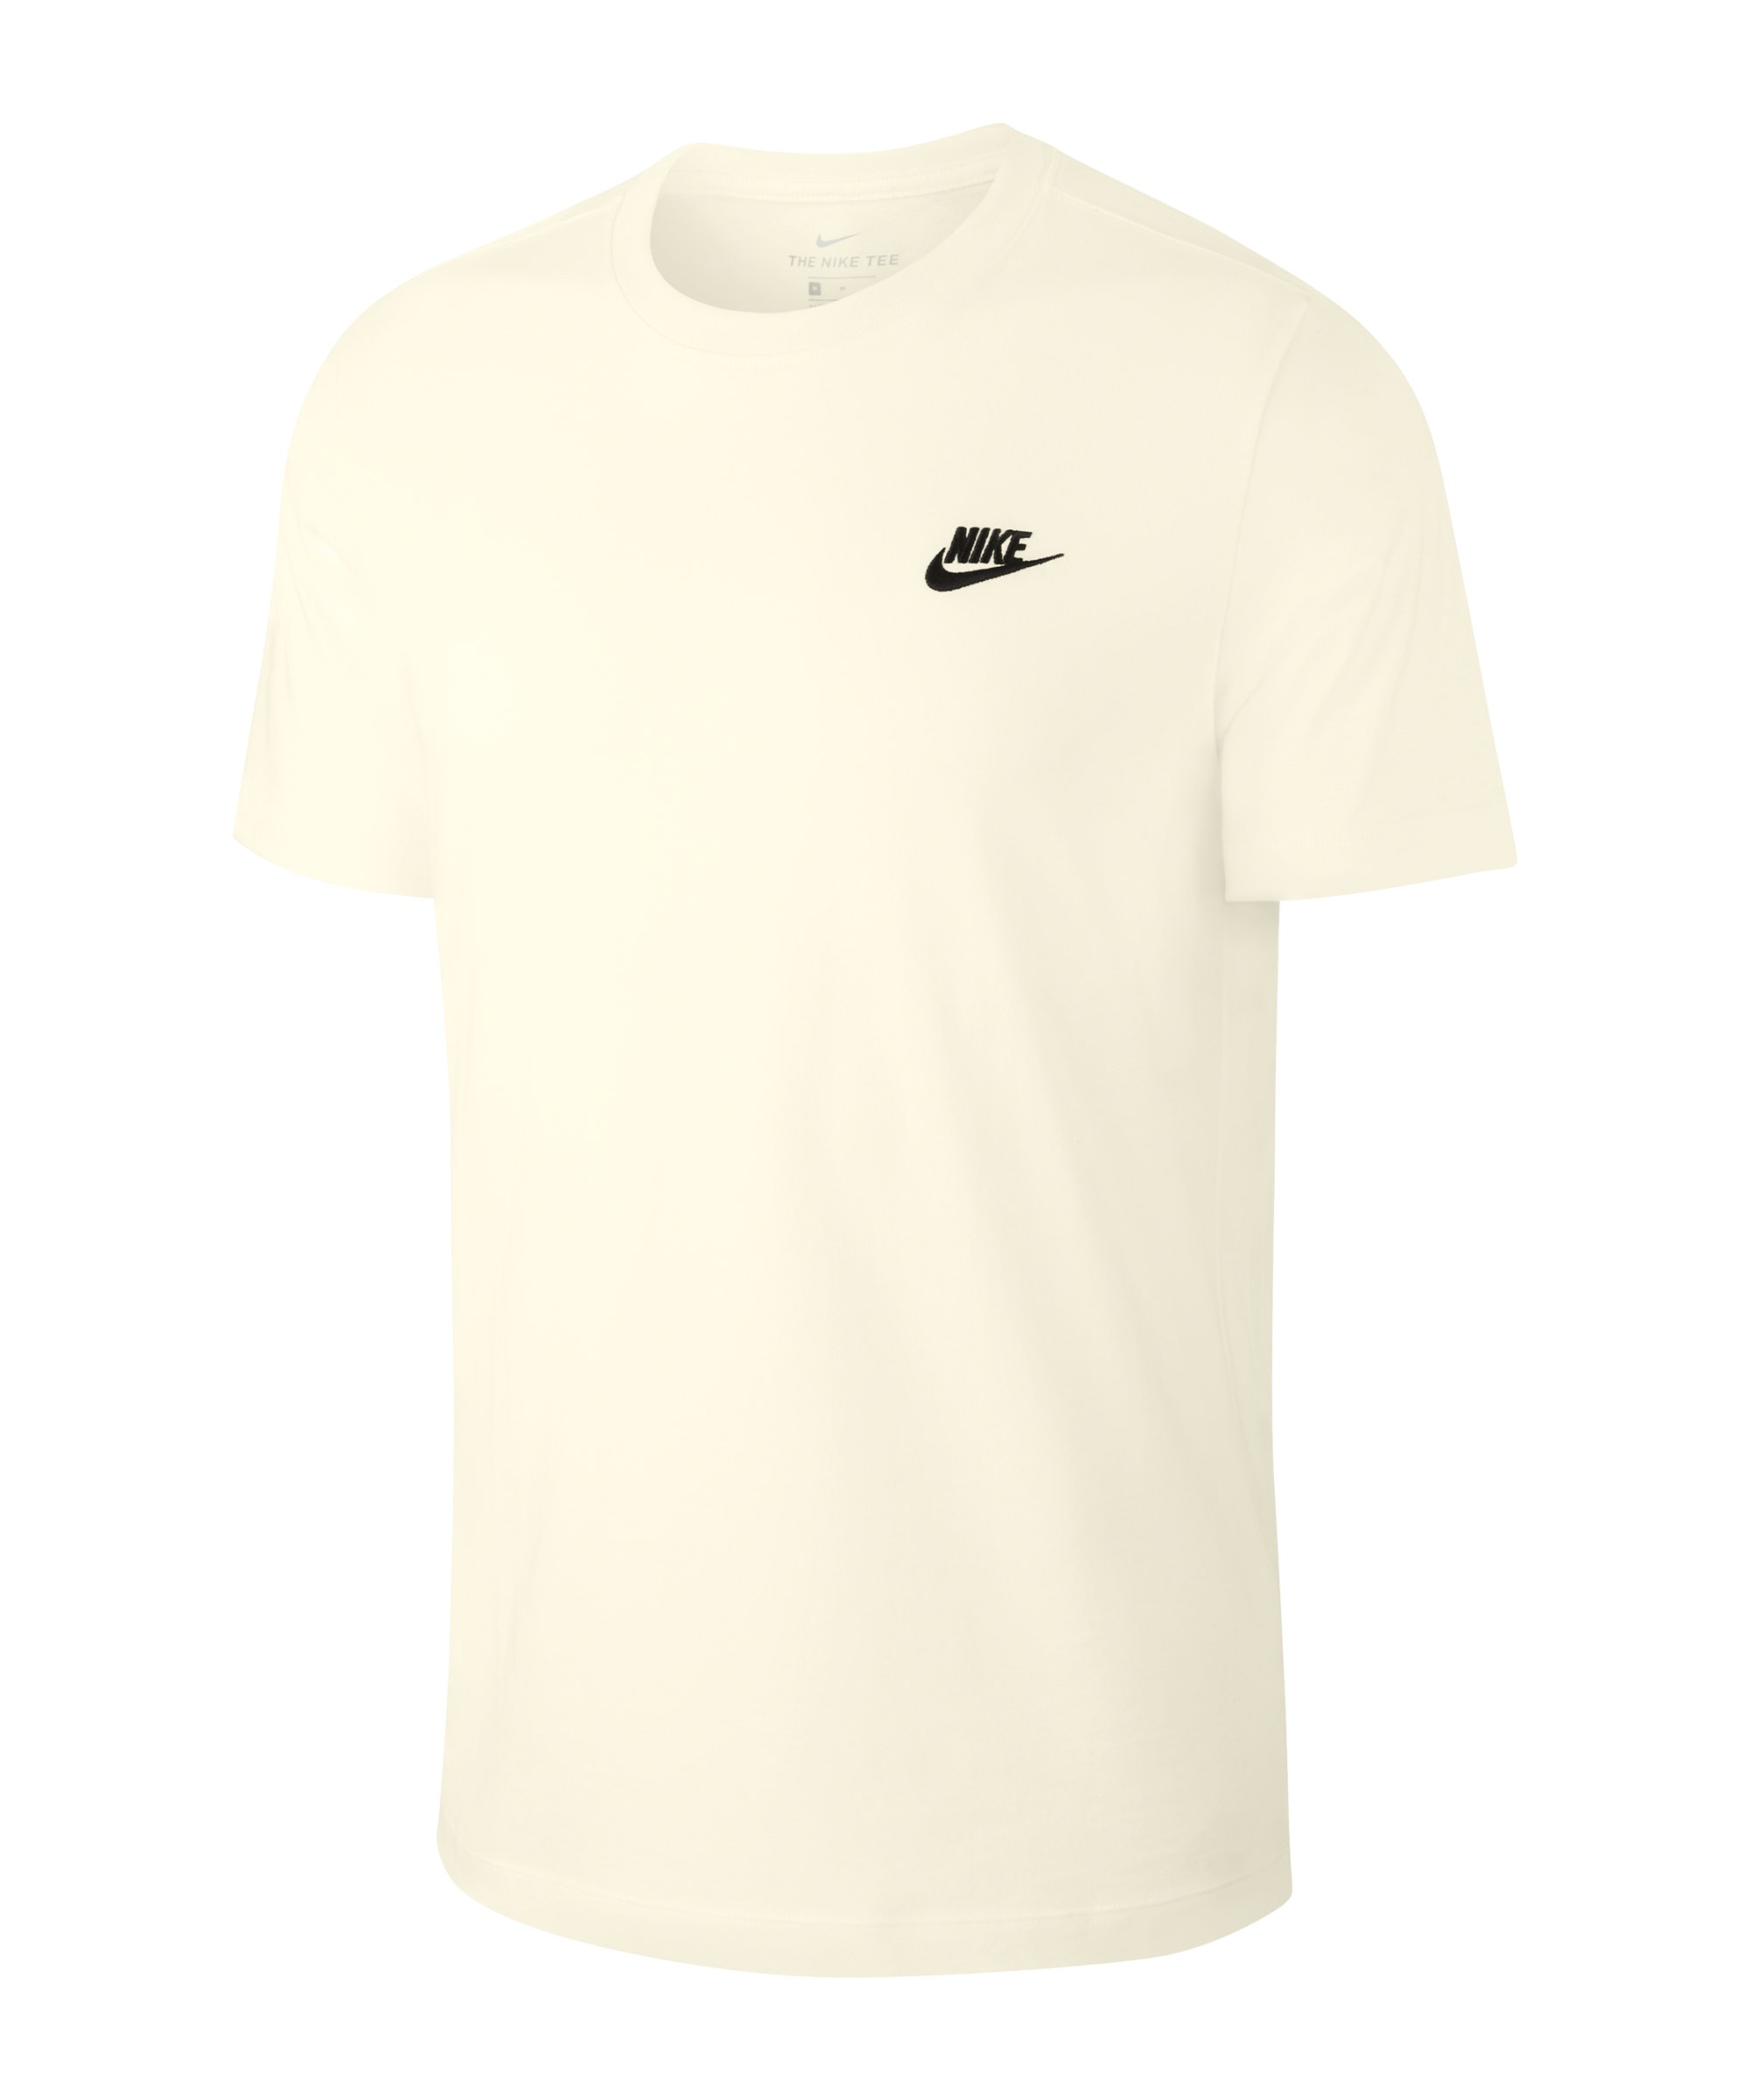 Nike Club T-Shirt Beige Schwarz F133 - beige